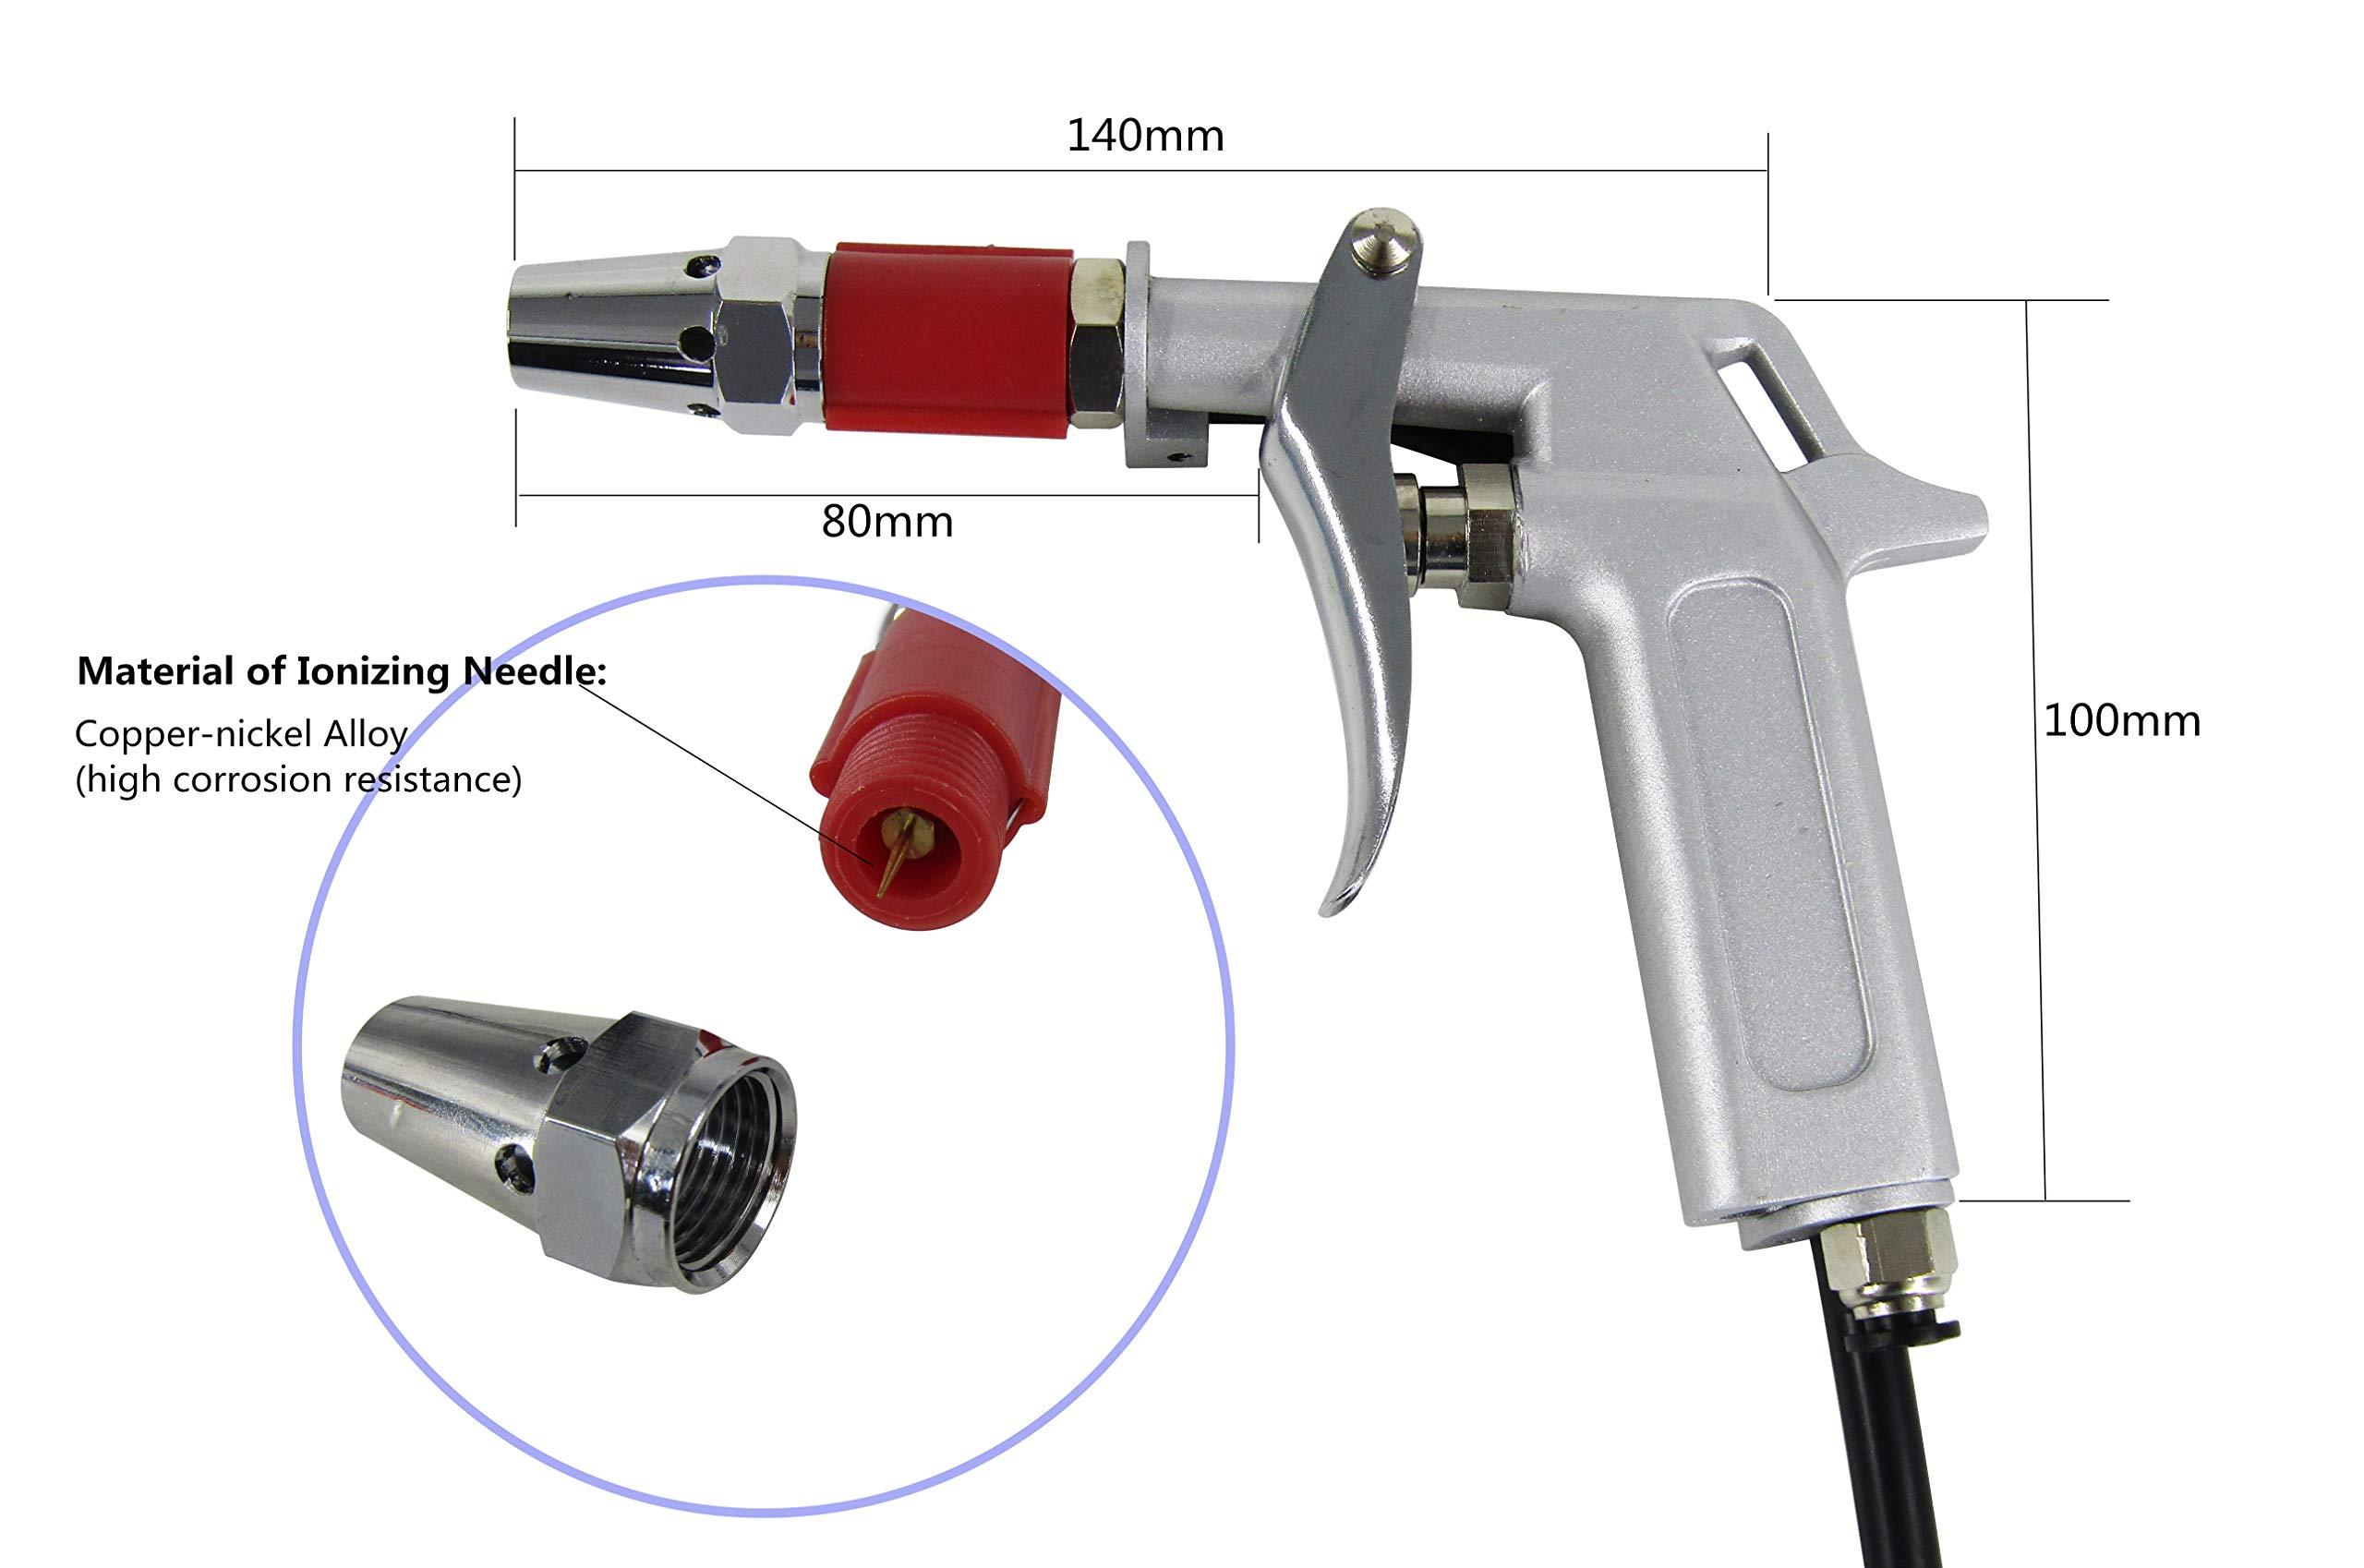 YUCHENGTECH Ionizing Air Gun Antistatic Sprayer Static Electrostatic Eliminator + High Voltage Generator 110V by YUCHENGTECH (Image #5)